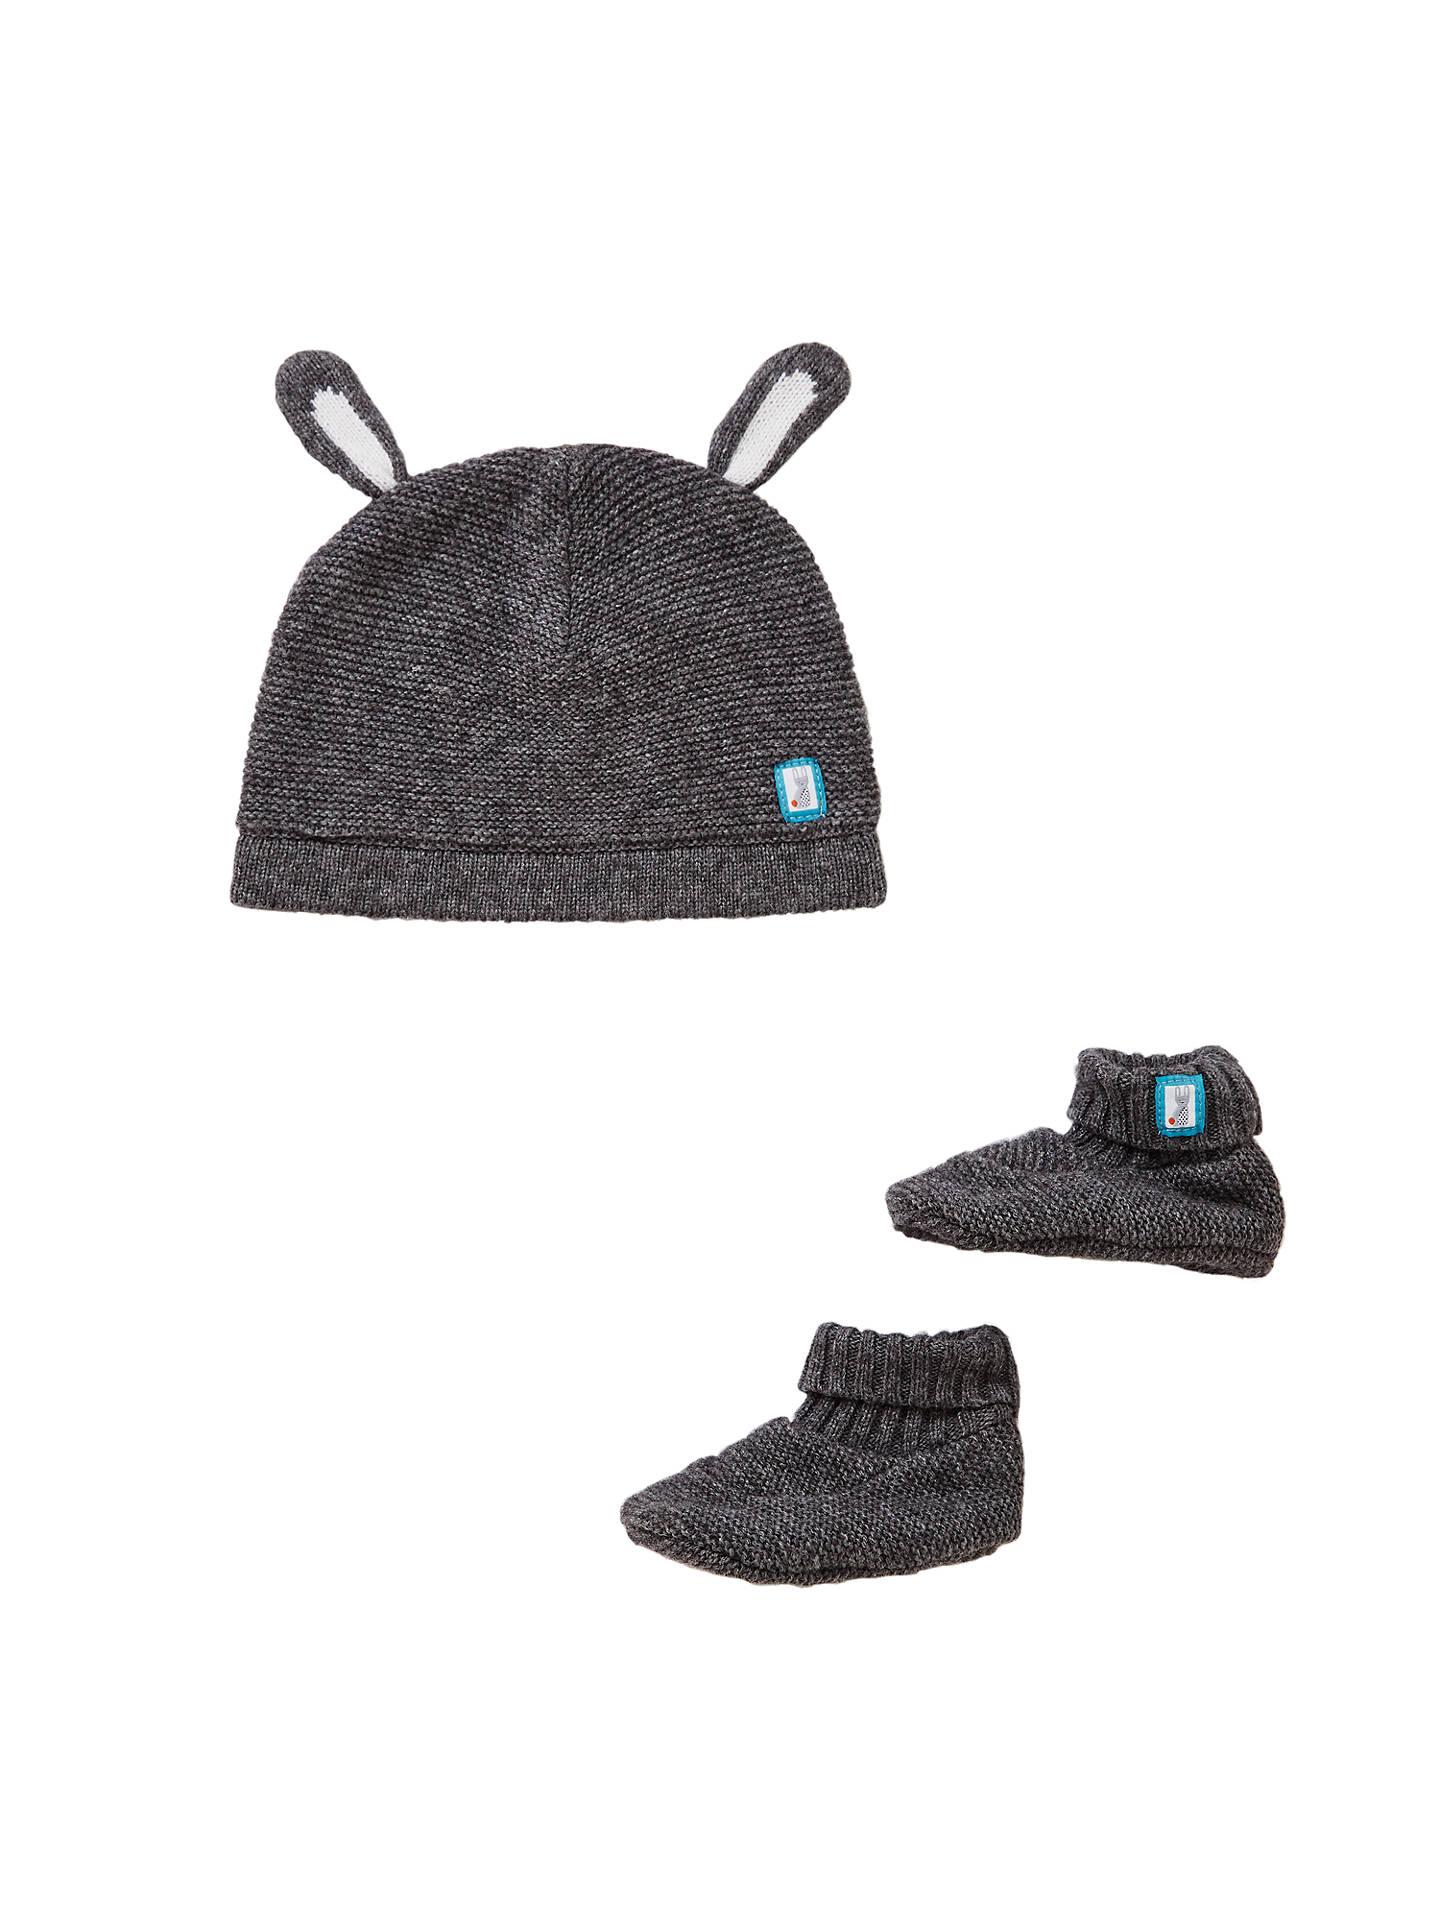 606625921 Buy John Lewis Baby Hat and Booties Set